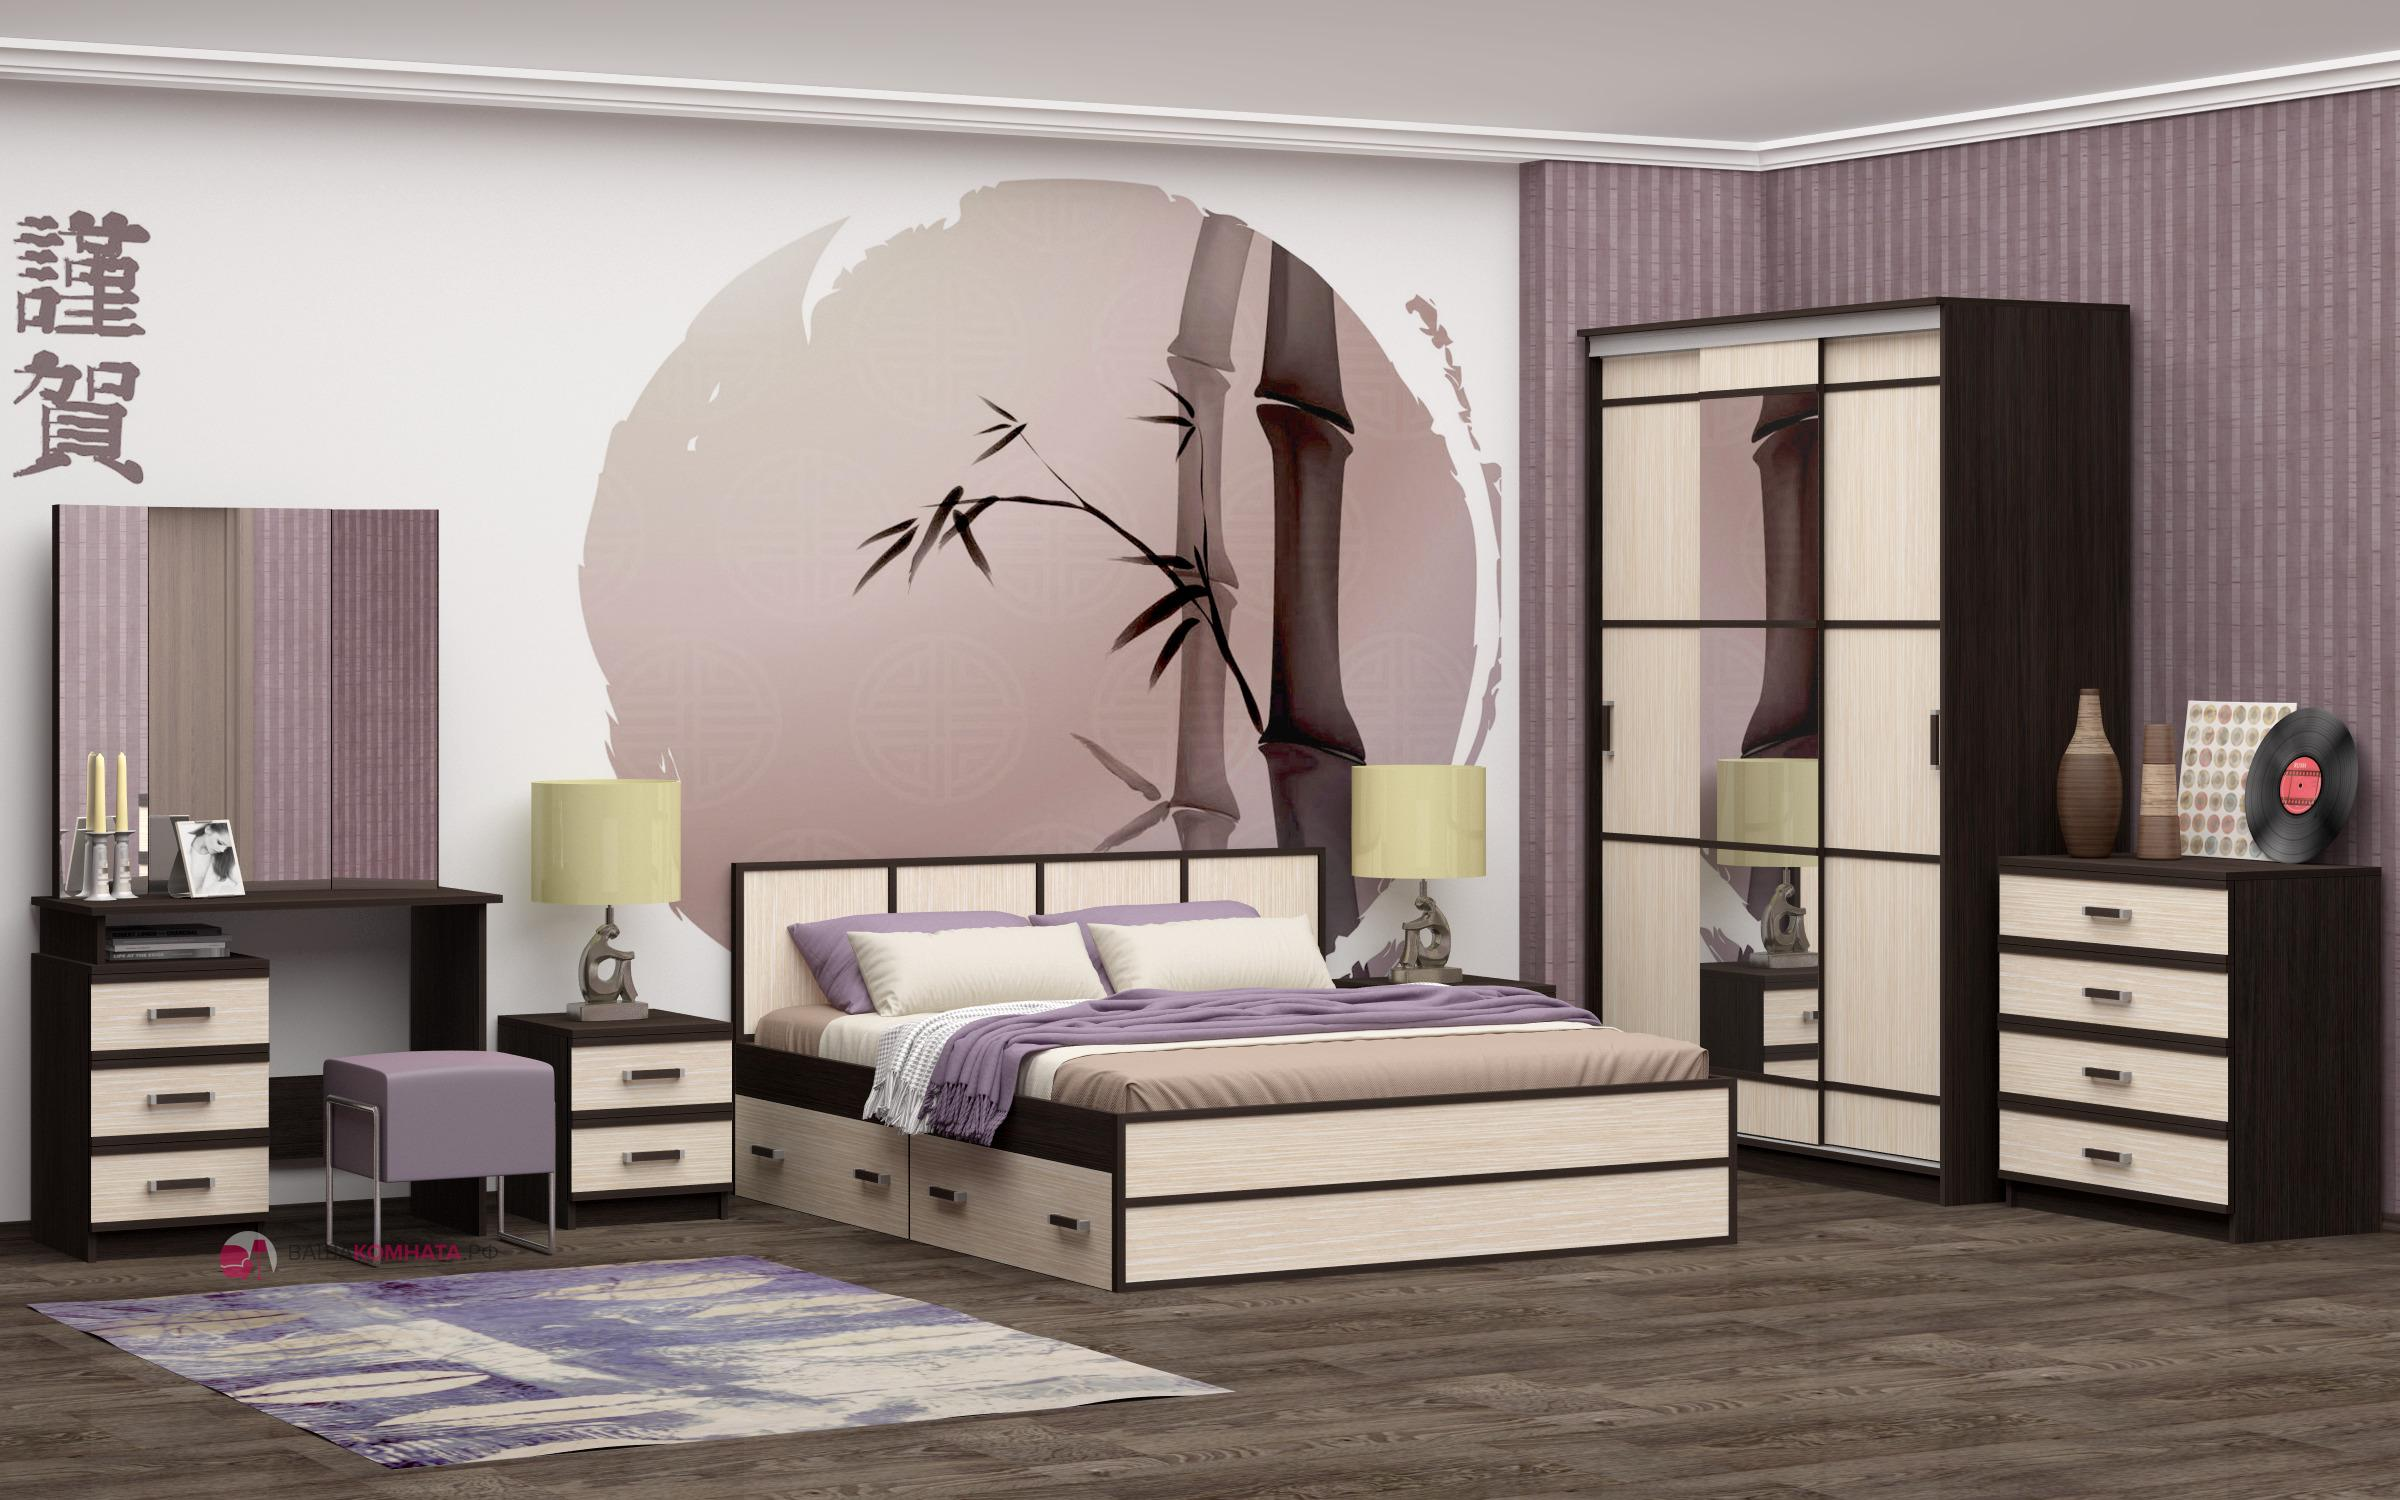 Интернет-магазин мебели YourRoom в СПб